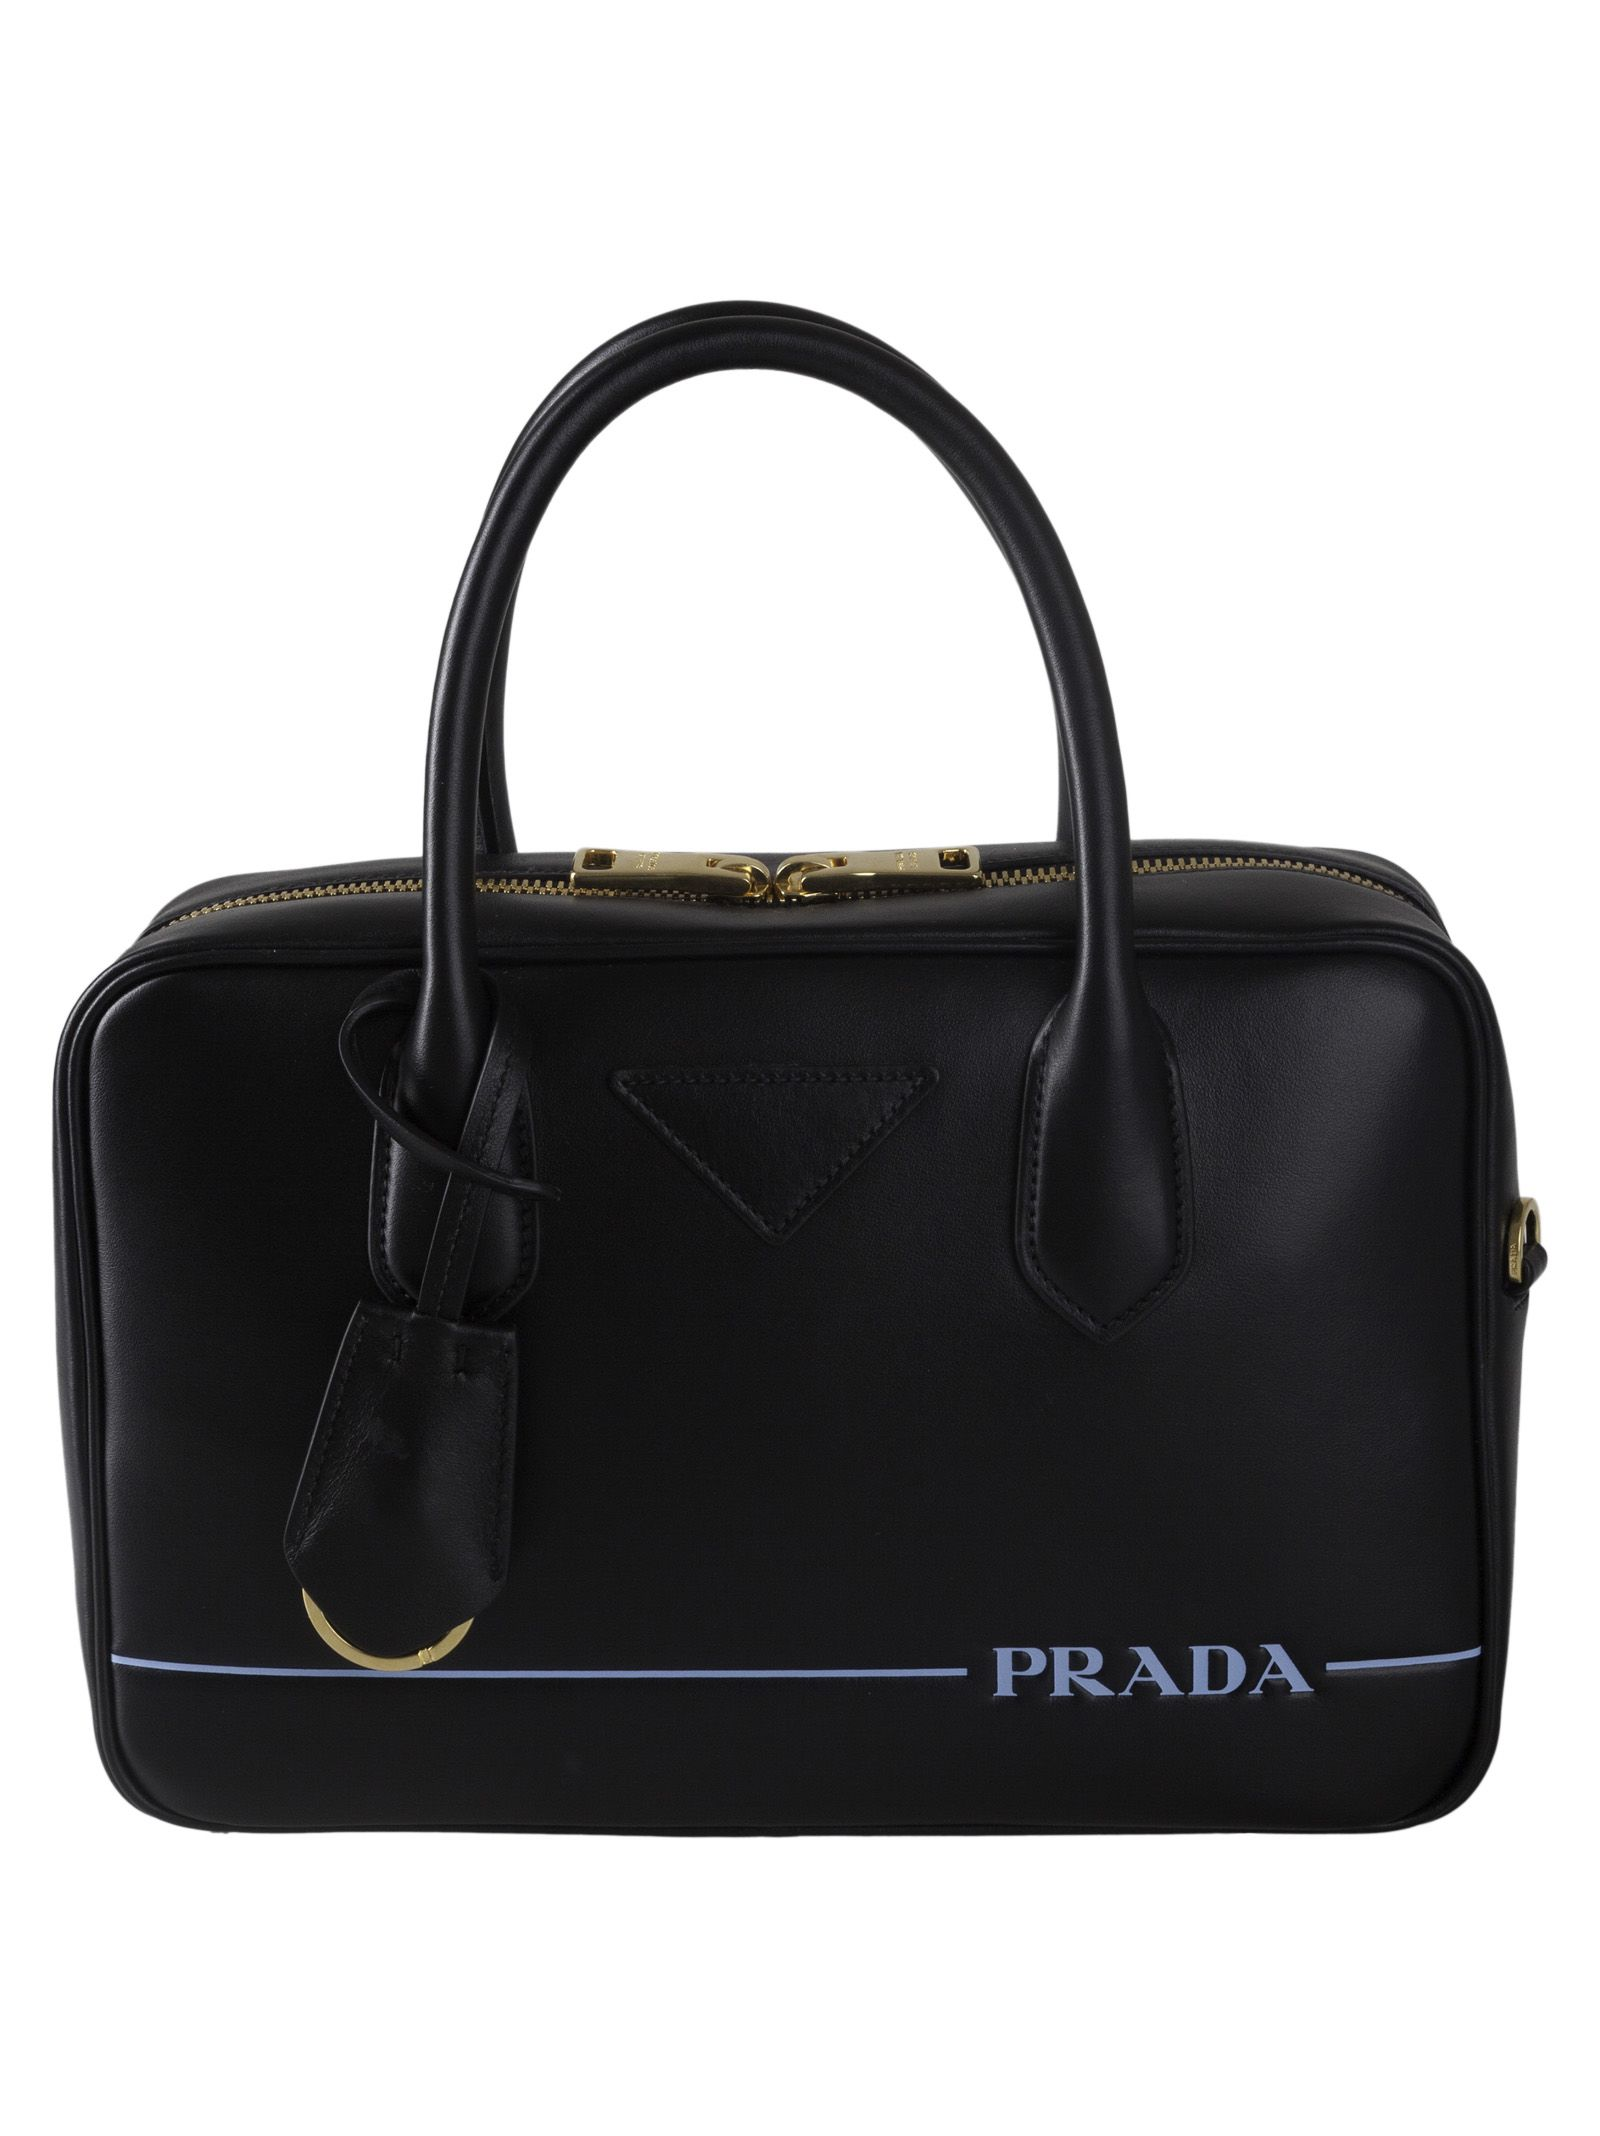 debd5b963ecb Prada Mirage Shoulder Bag | £1,106.15 | Port